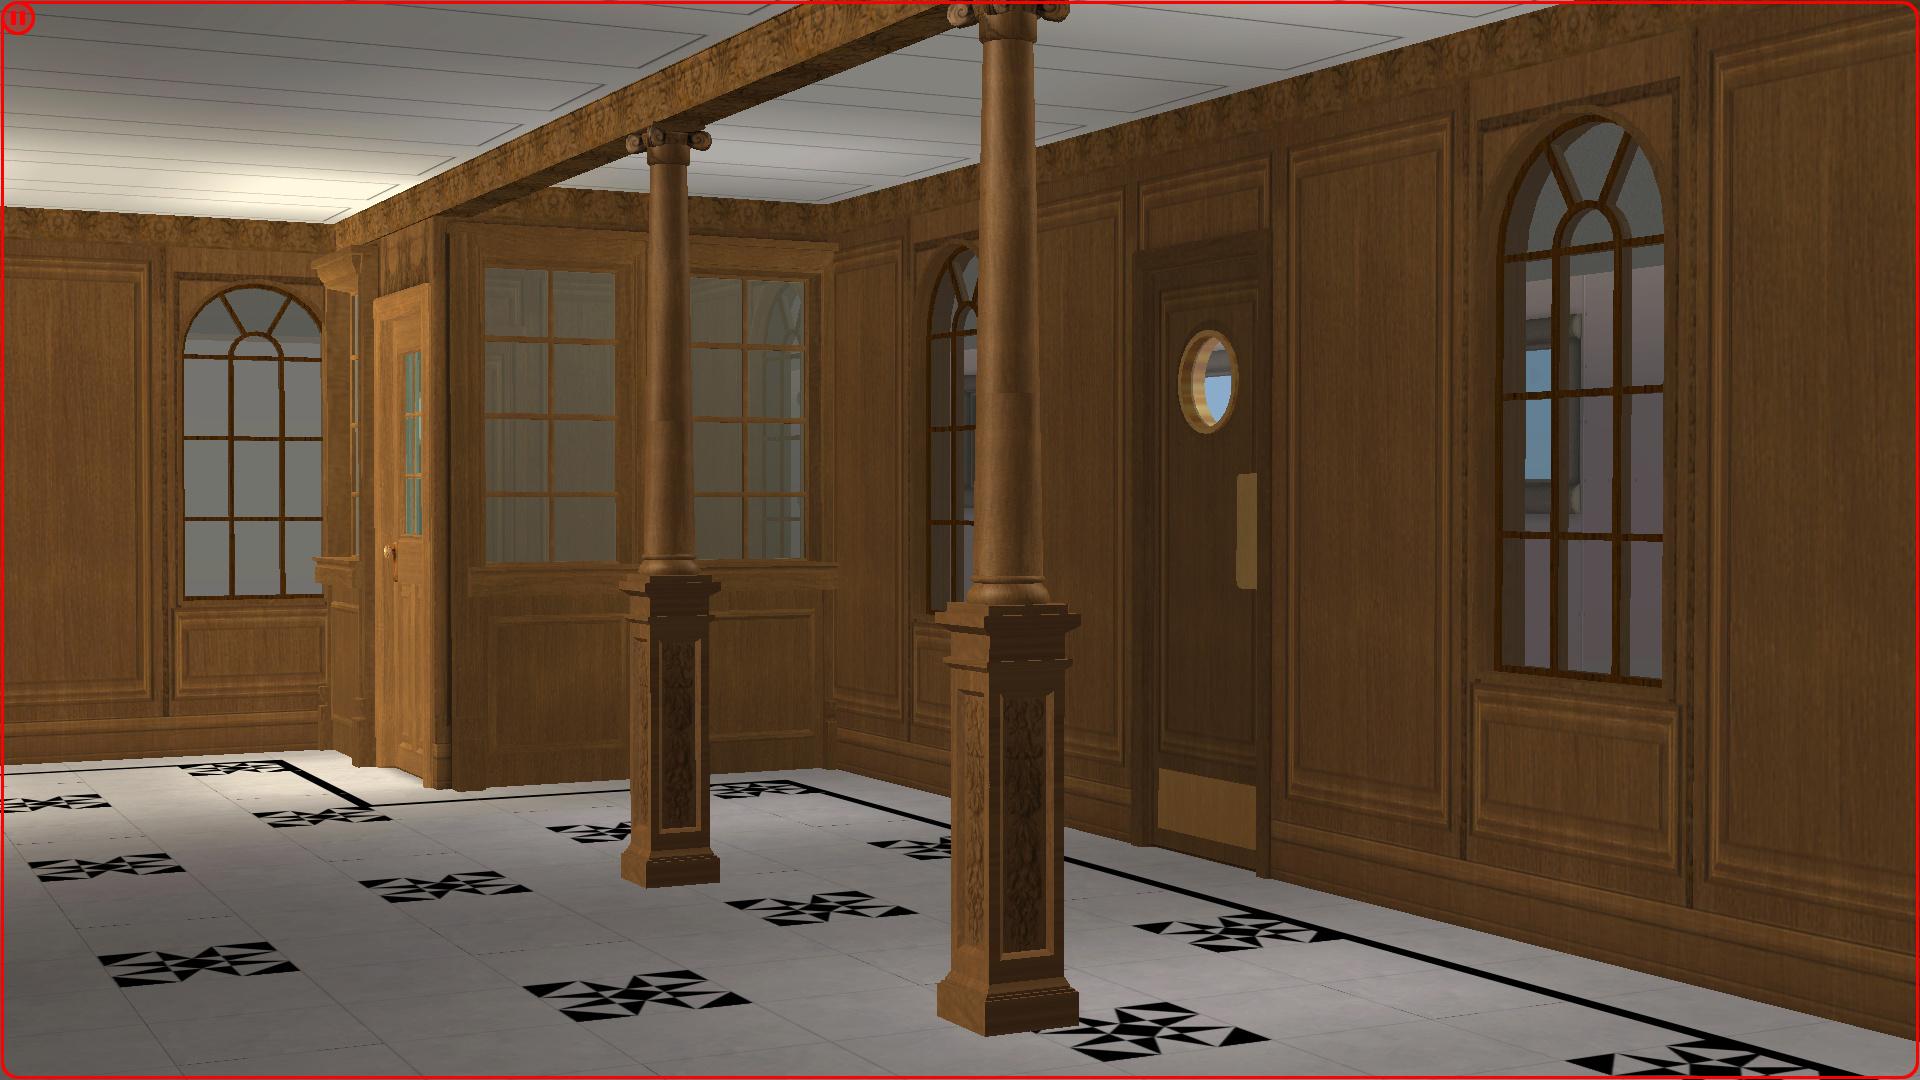 The Sims 2 Titanic Sims2e58